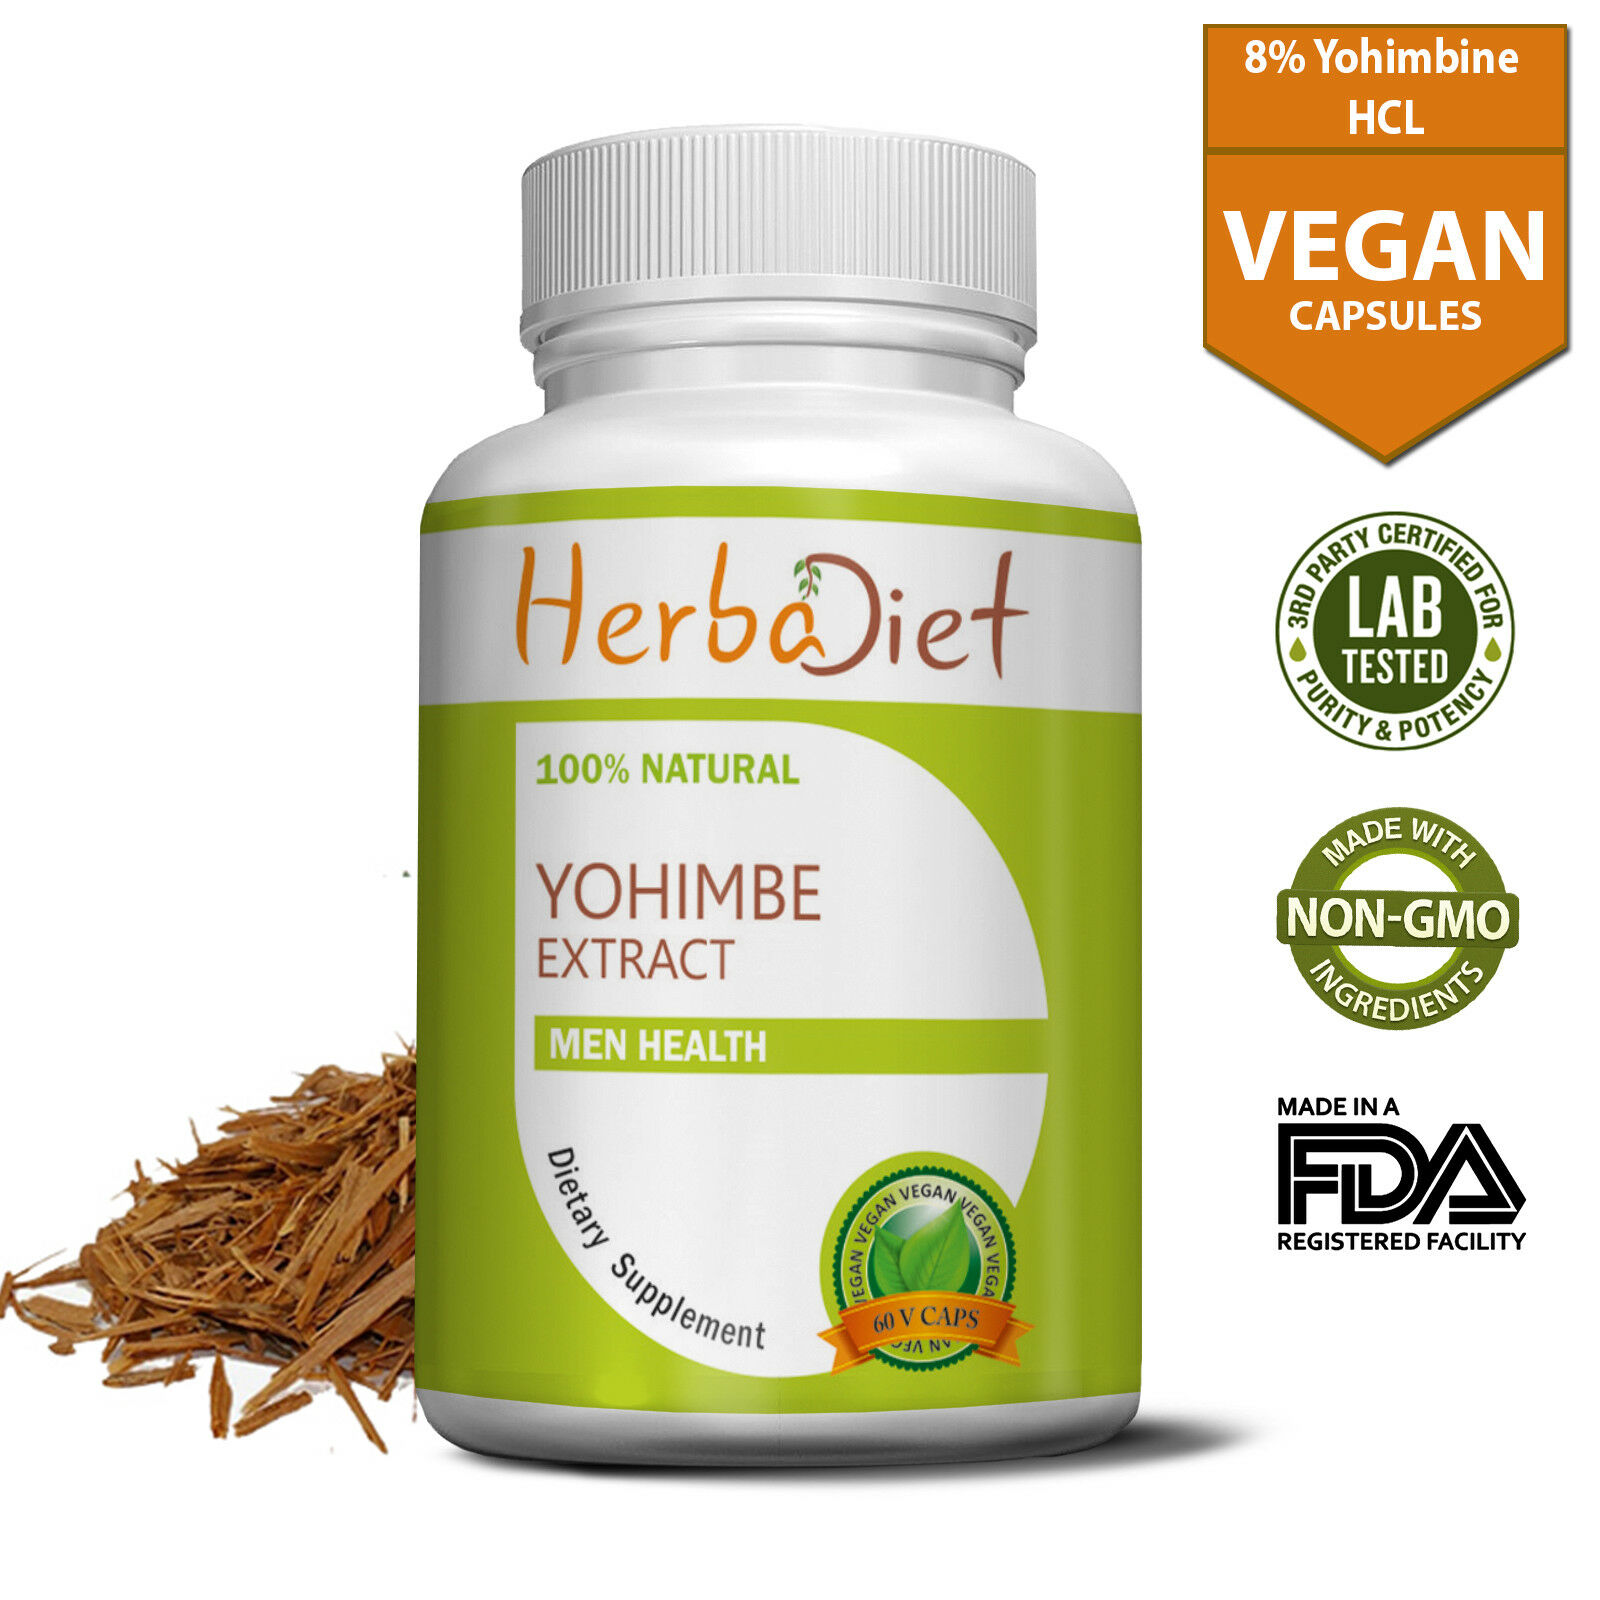 Yohimbe Bark Extract Capsules Yohimbiine HCL 8% Fat Burner L